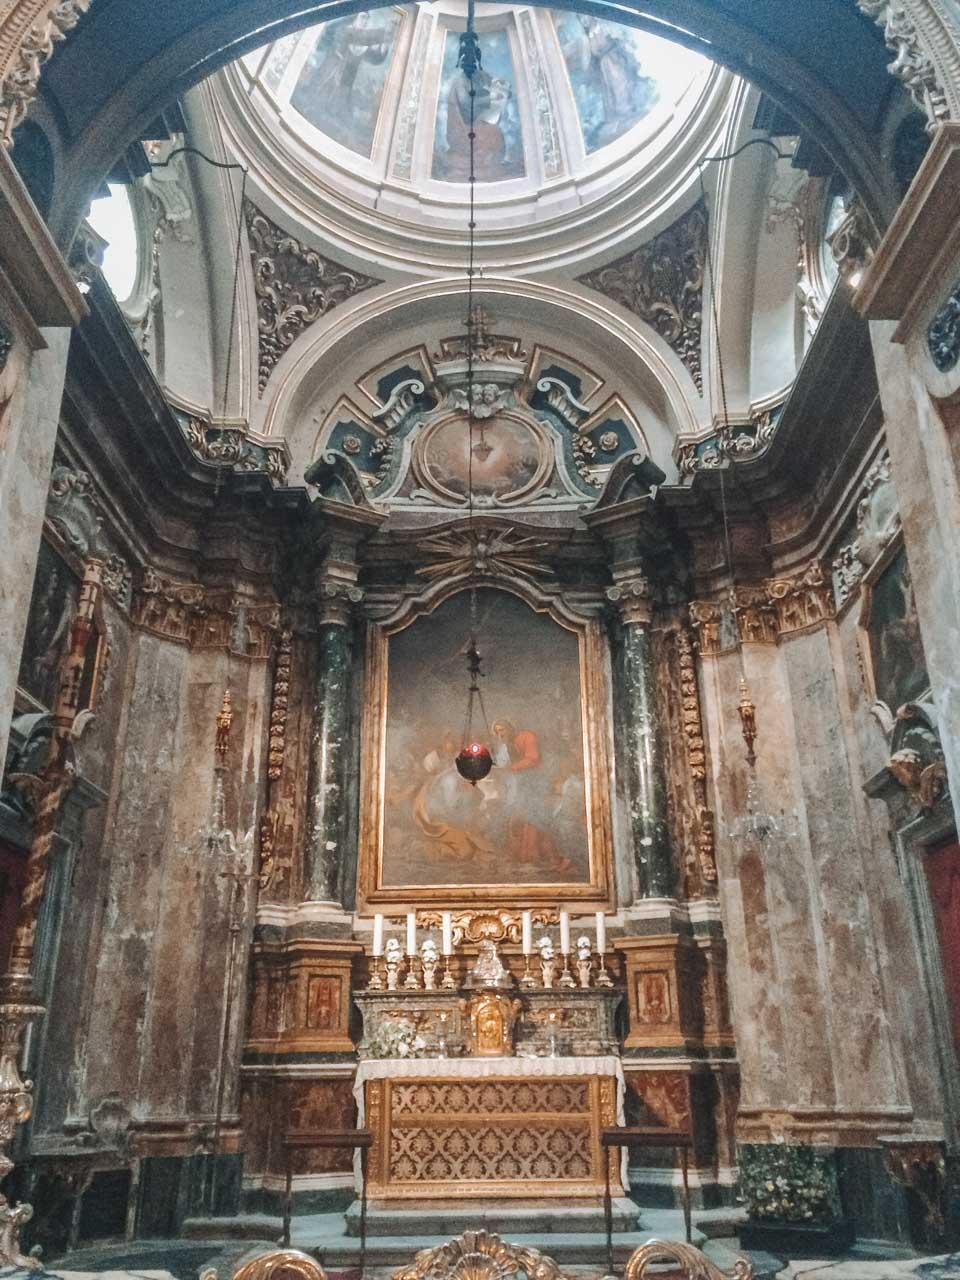 The inside of the Collegiate Parish Church of St. Paul's Shipwreck in Valletta, Malta